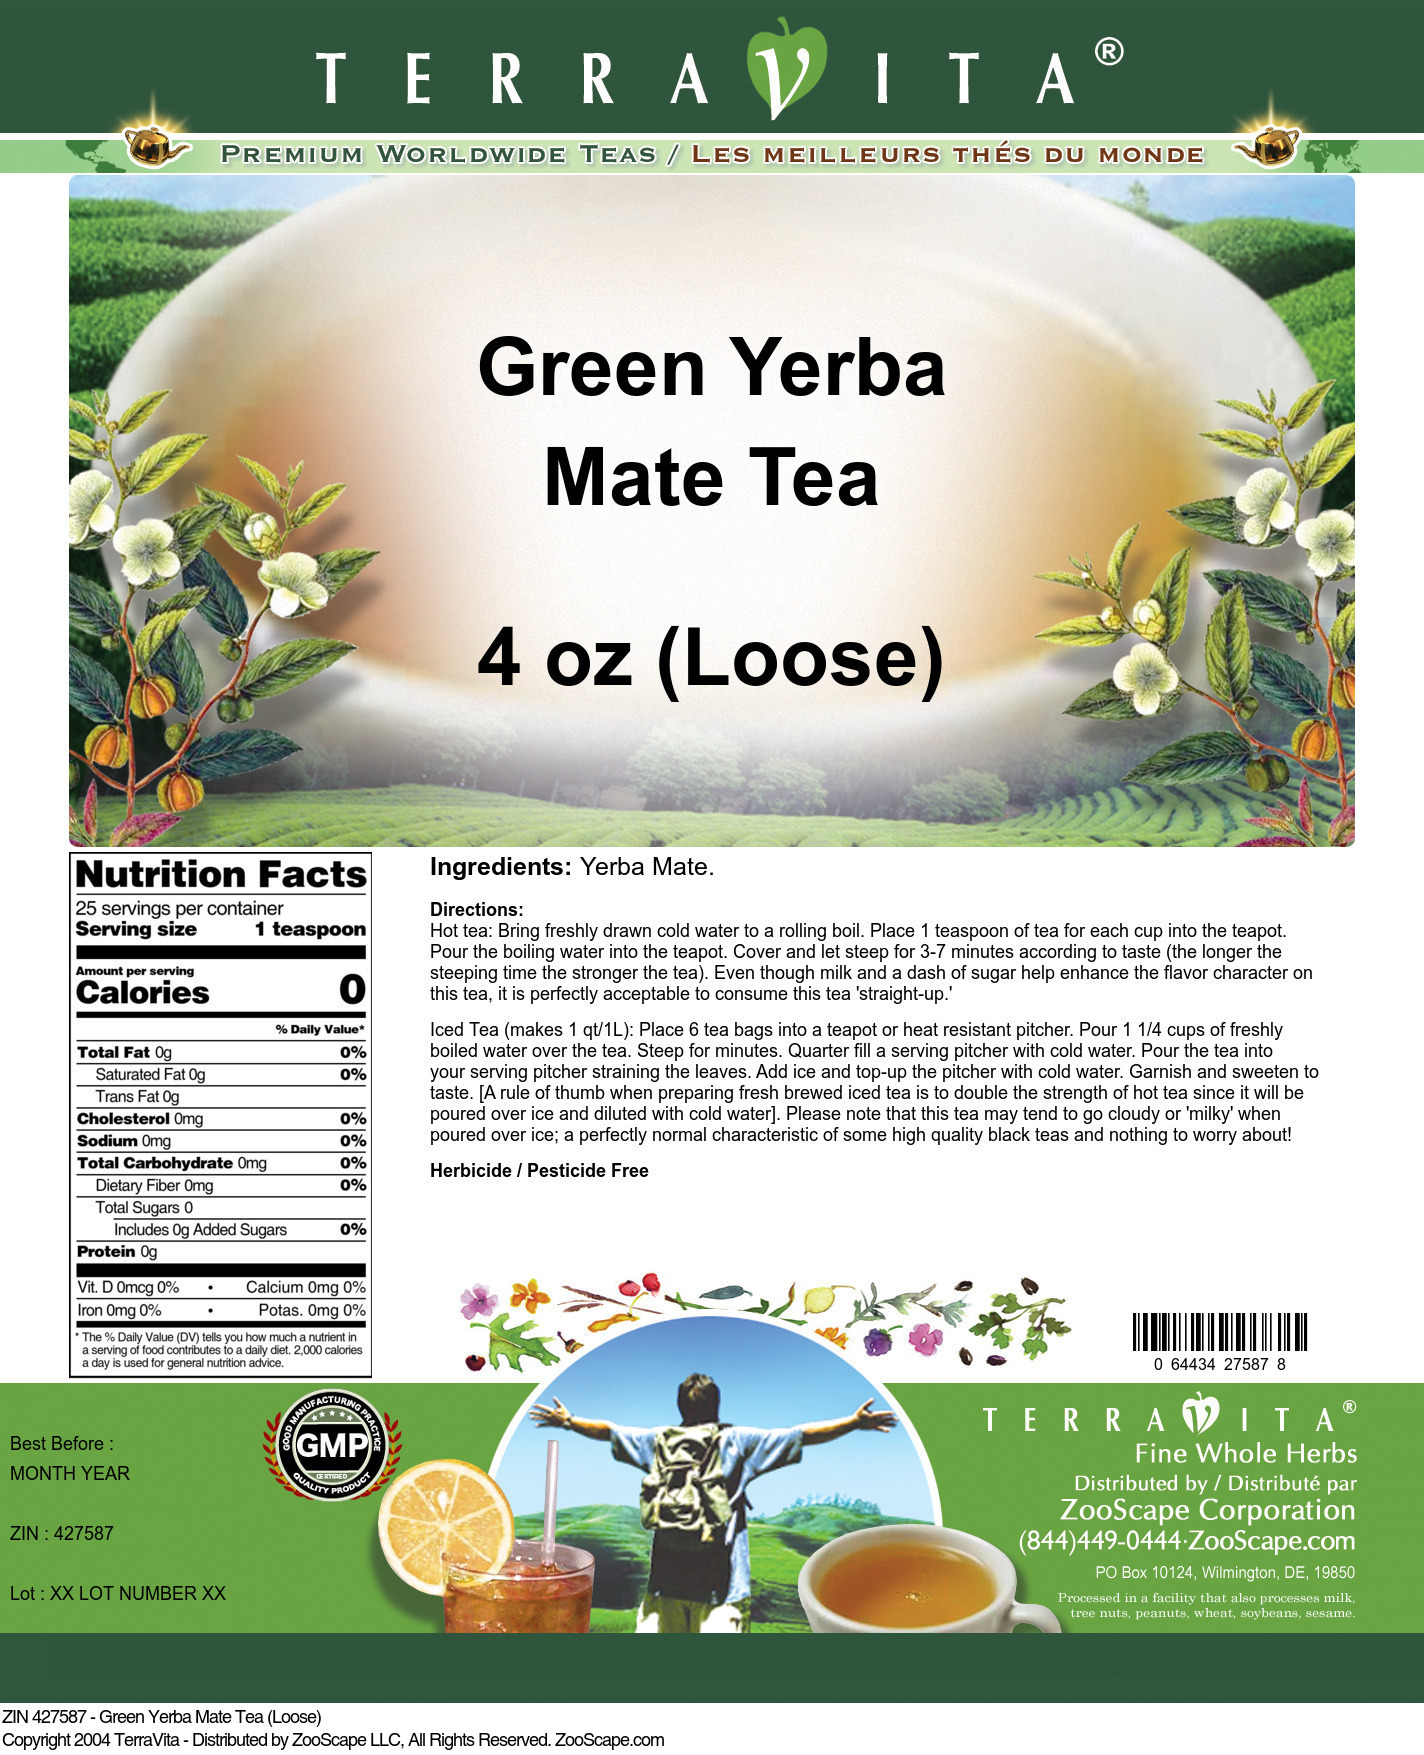 Green Yerba Mate